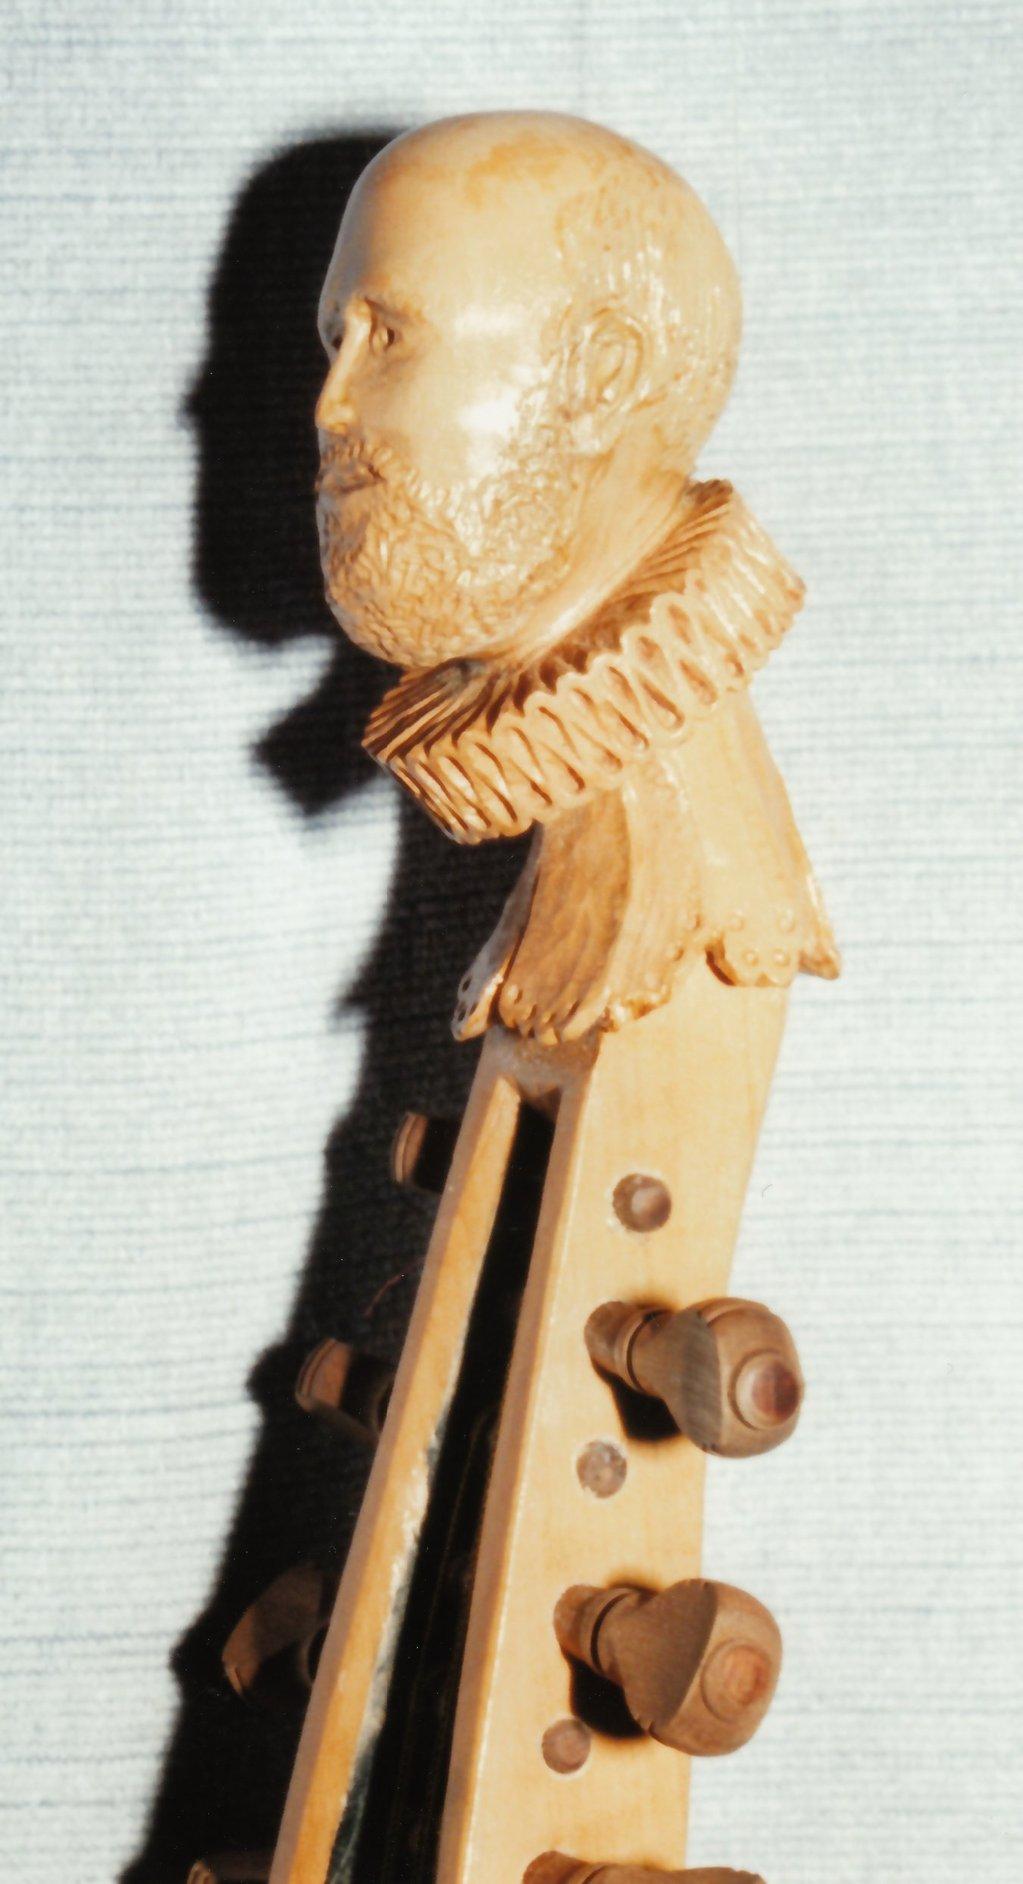 Fabrication d'instruments de musique anciens de bgire - Page 2 Vrx6Ib-1994-Bandora-17